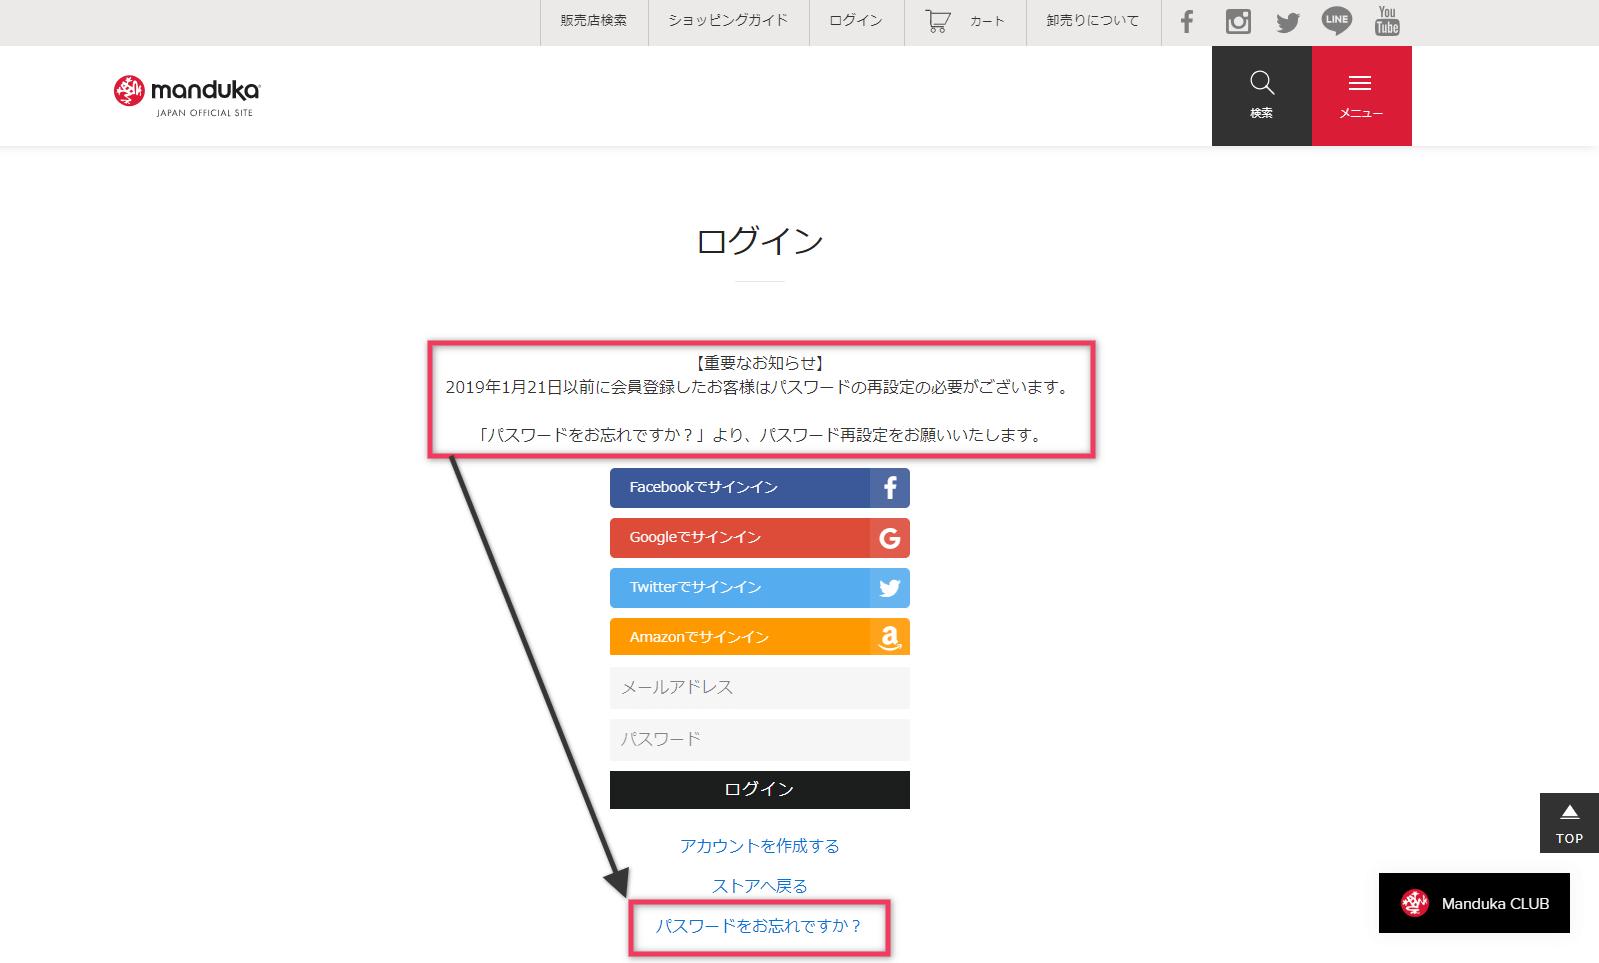 Password reissue - Manduka 日本公式サイト サイトリニューアルのお知らせ